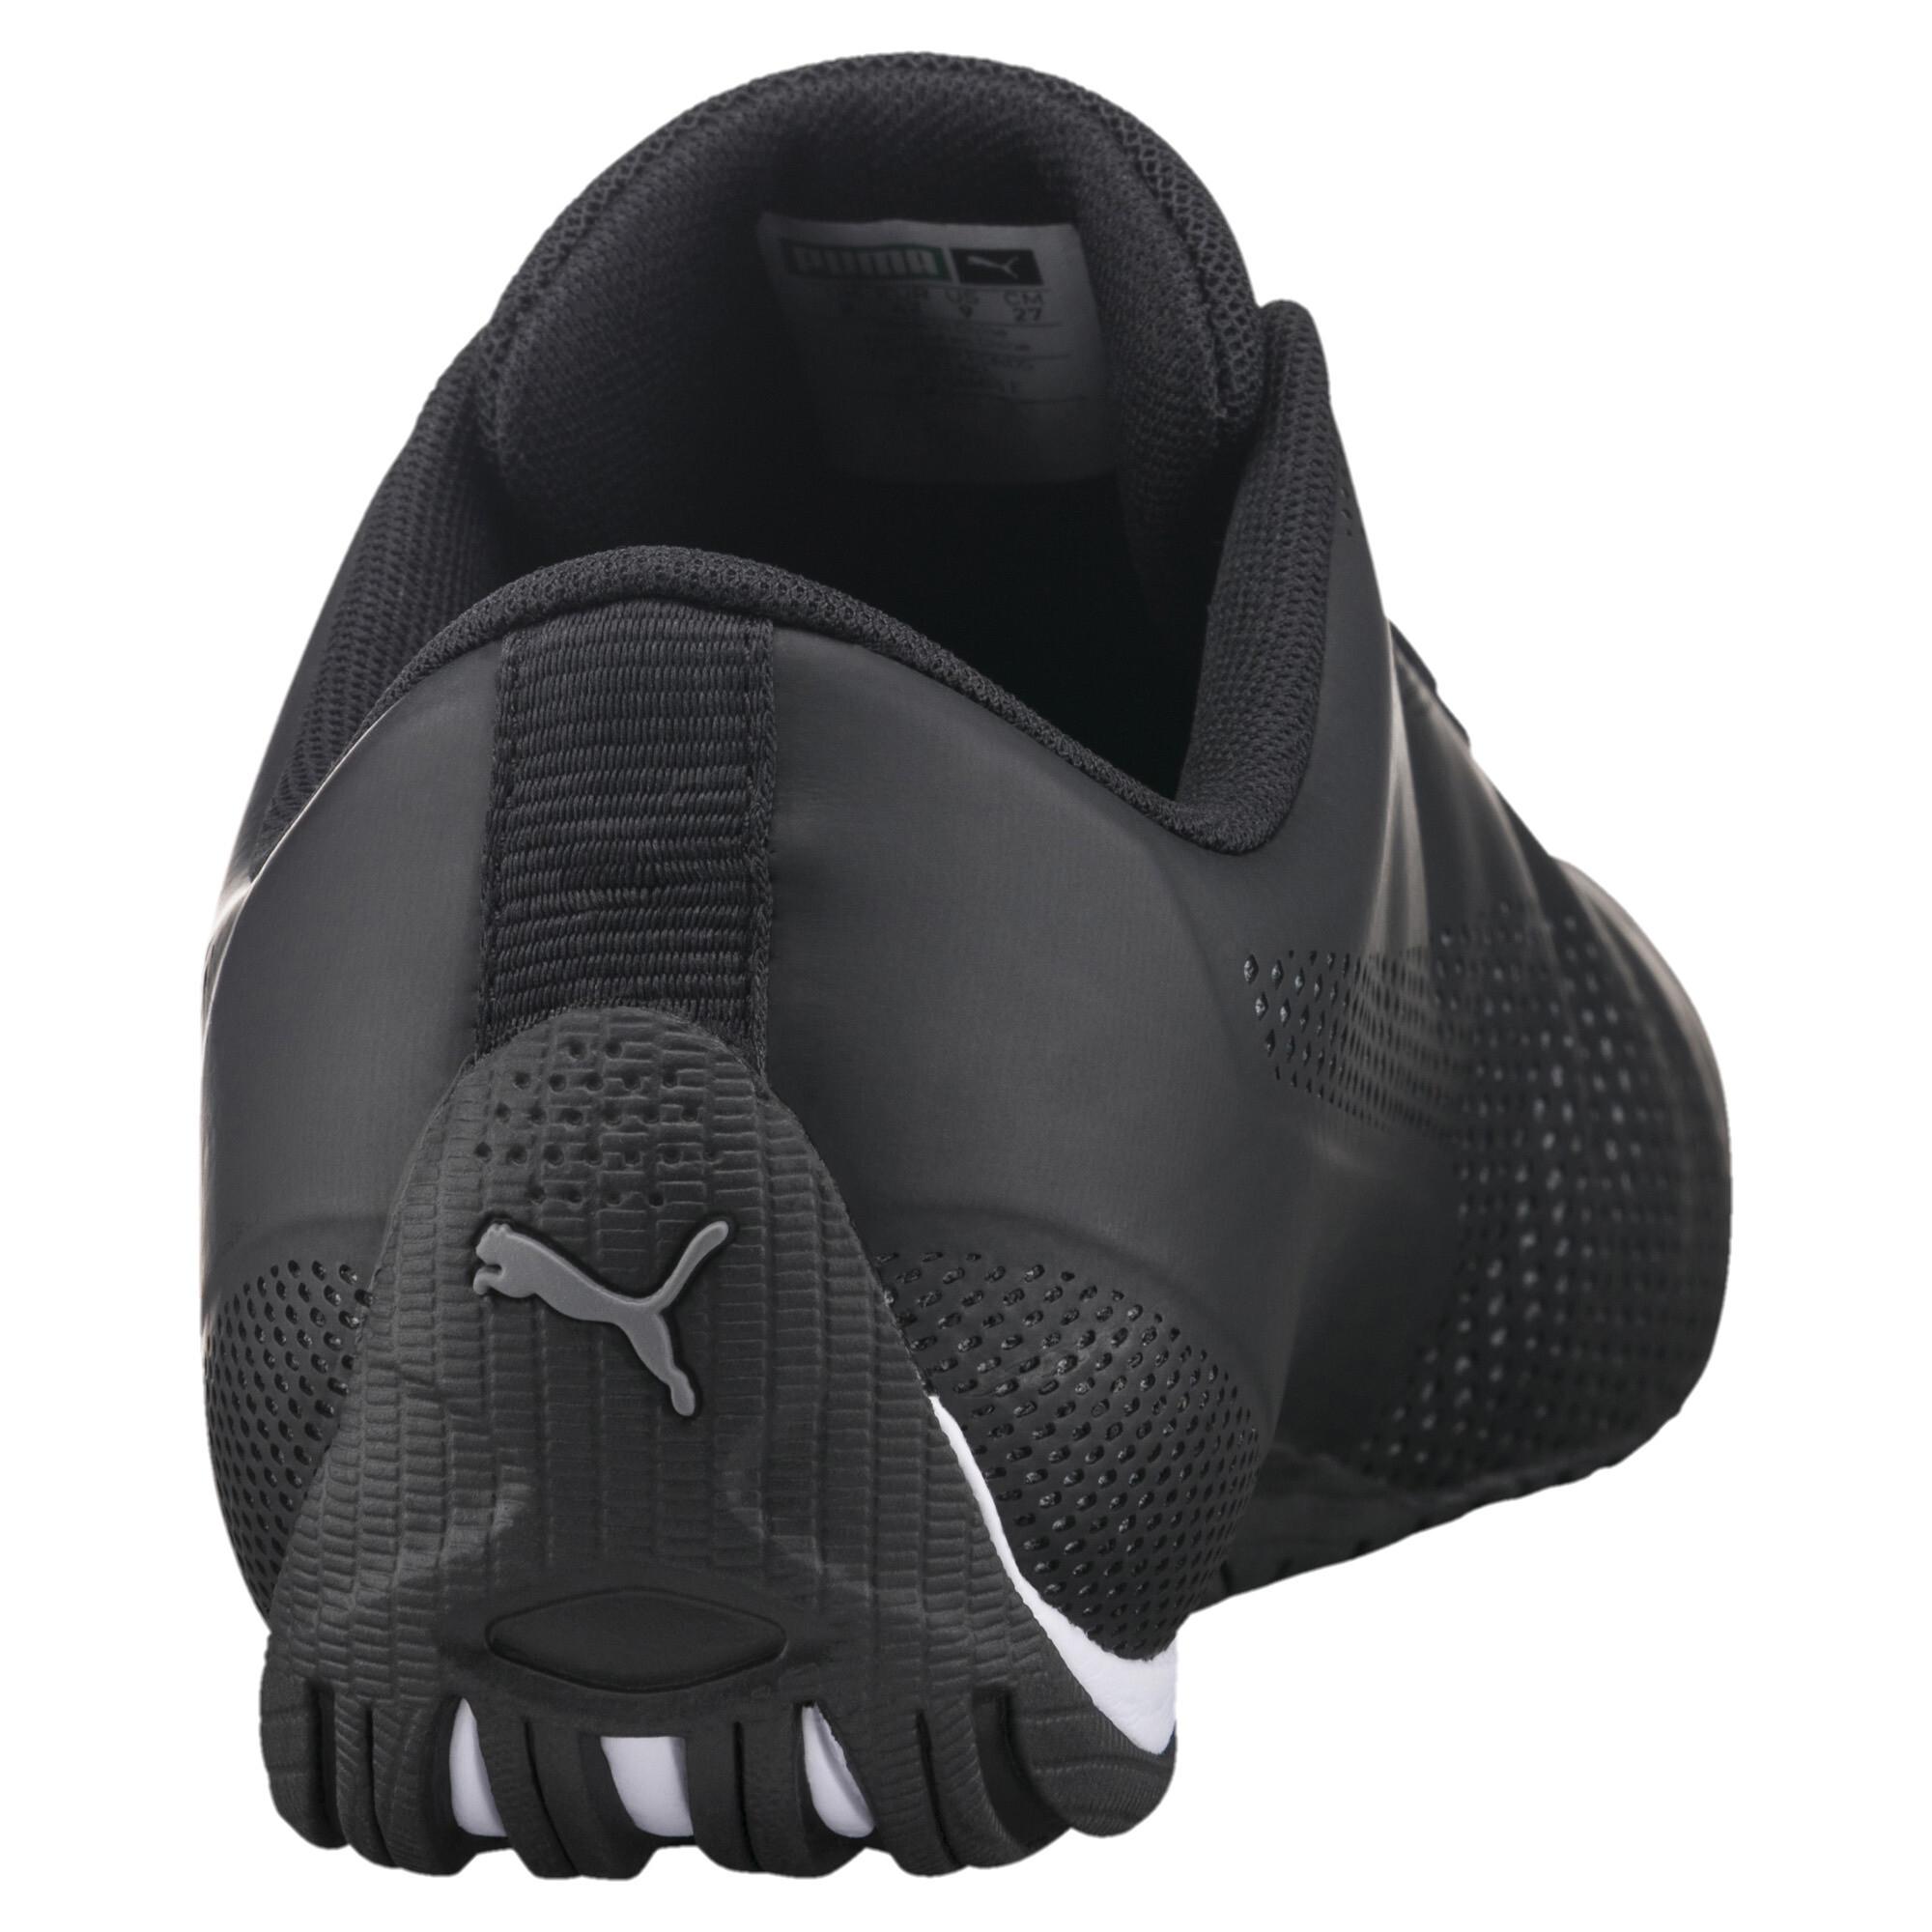 PUMA-Drift-Cat-5-Ultra-Men-s-Shoes-Men-Shoe-Sport-Classics thumbnail 3